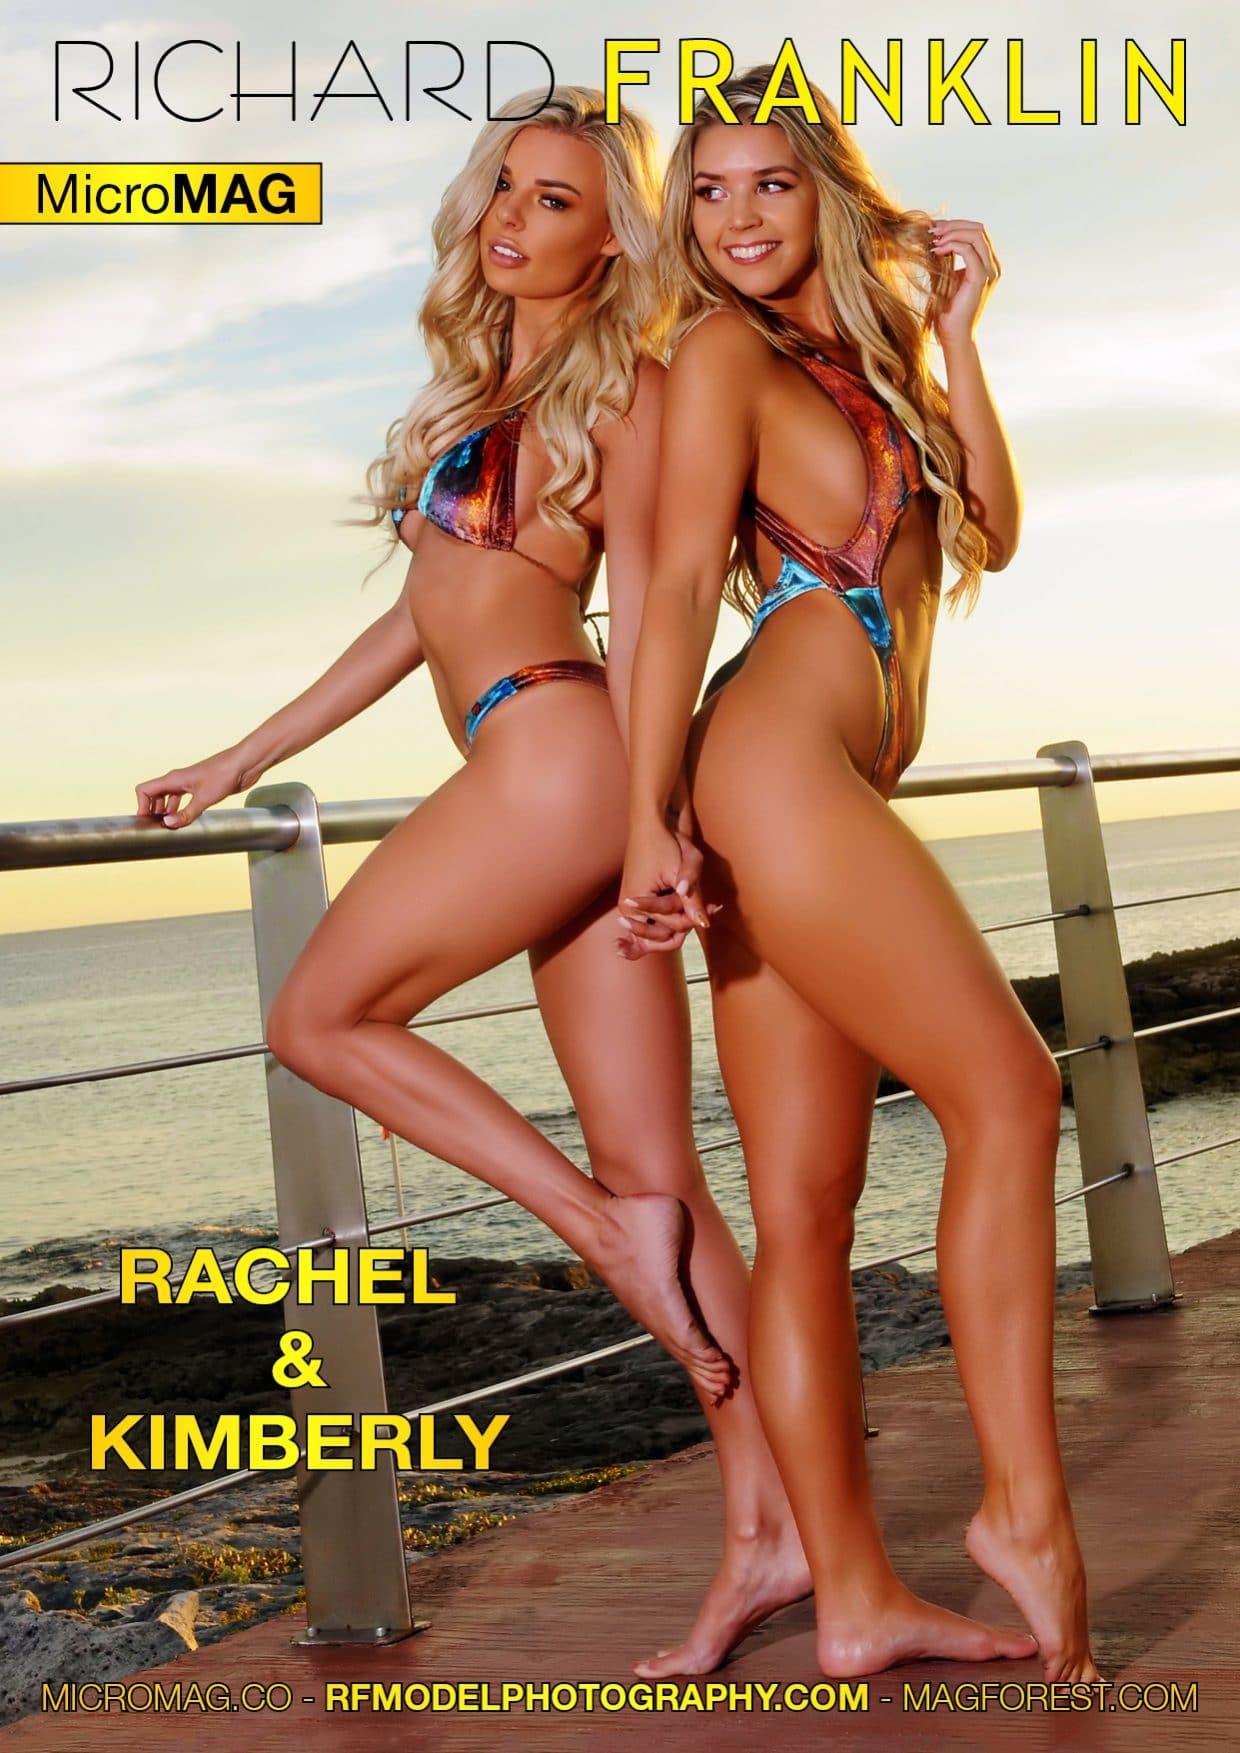 Richard Franklin MicroMAG - Rachel & Kimberly 1